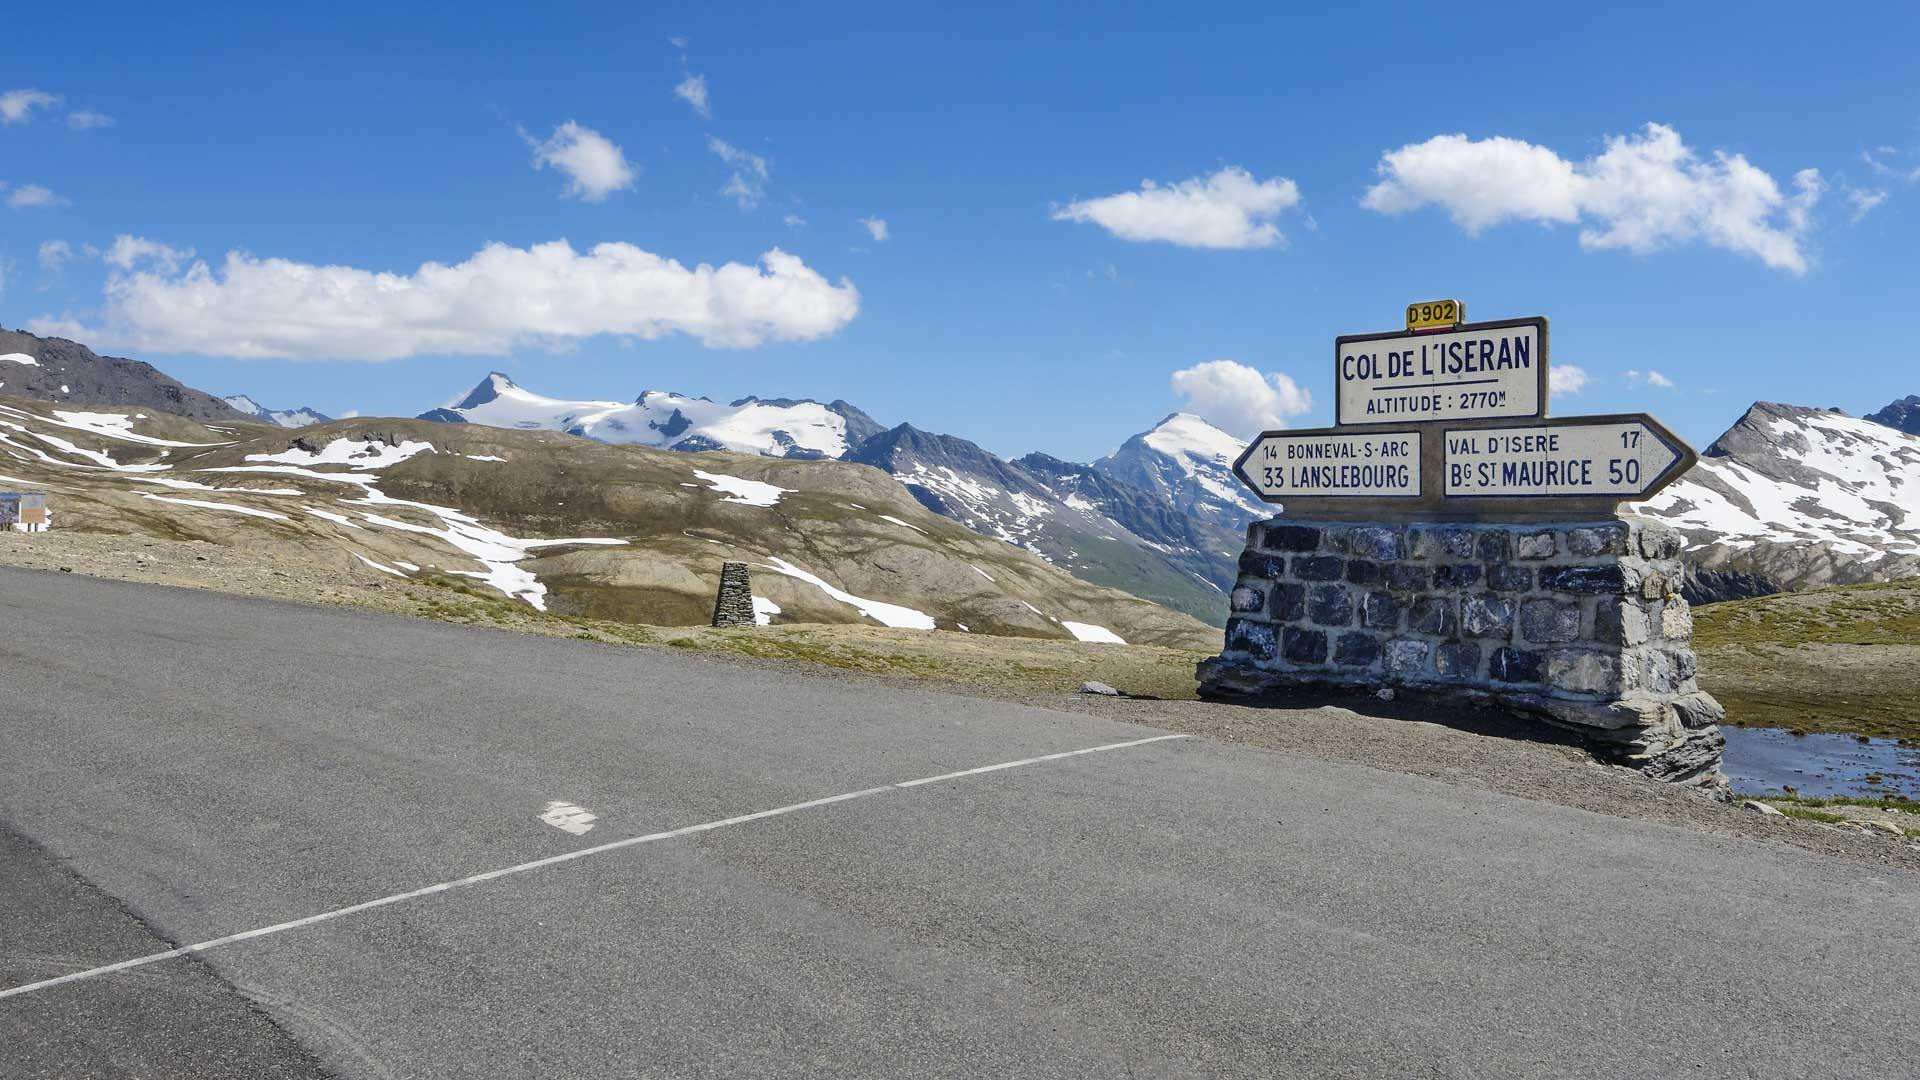 Summit of the Col de l'Iseran cycling climb, France